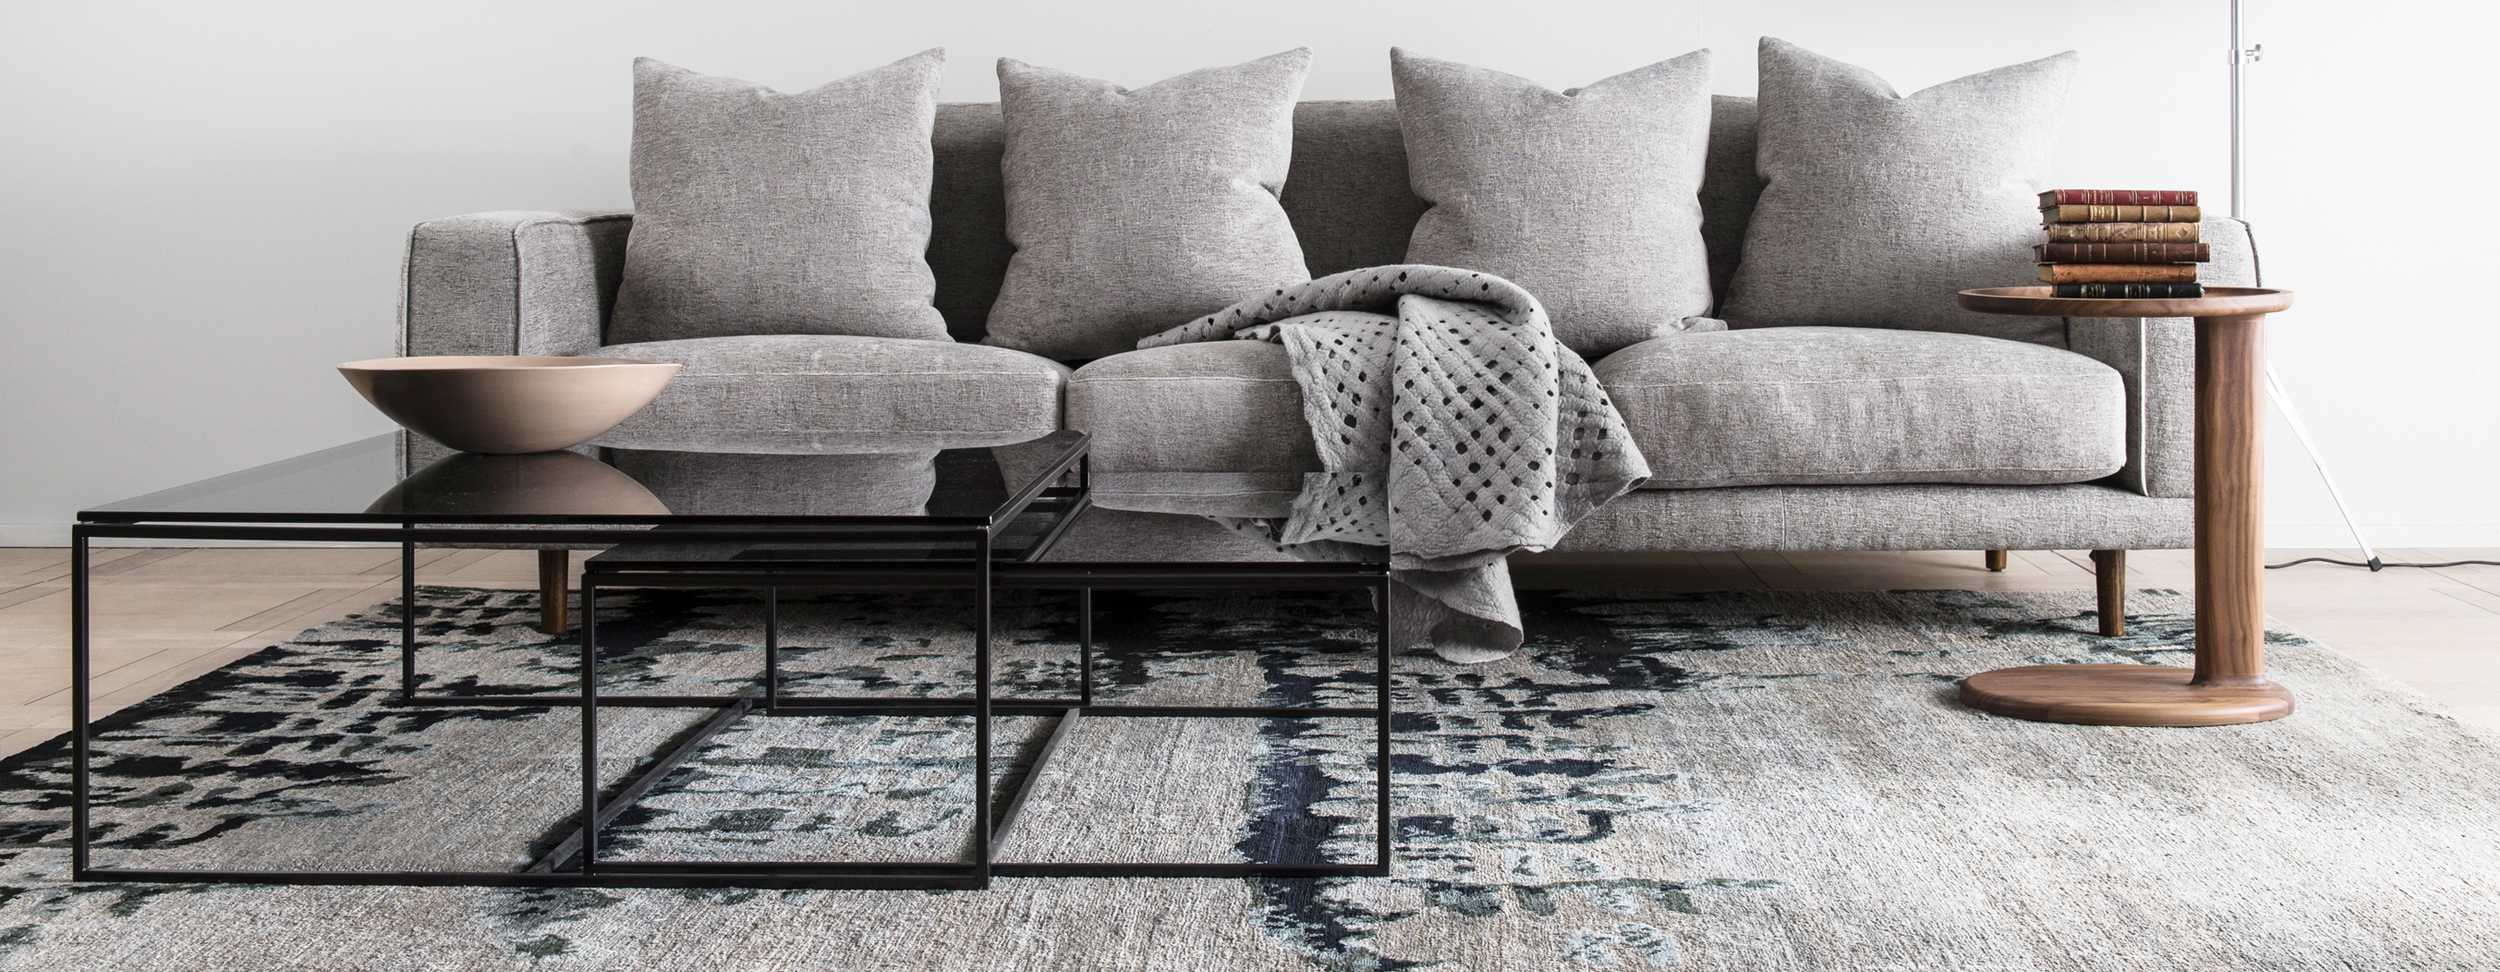 Designer Coffee Tables Sydney Melbourne Fanuli Furniture